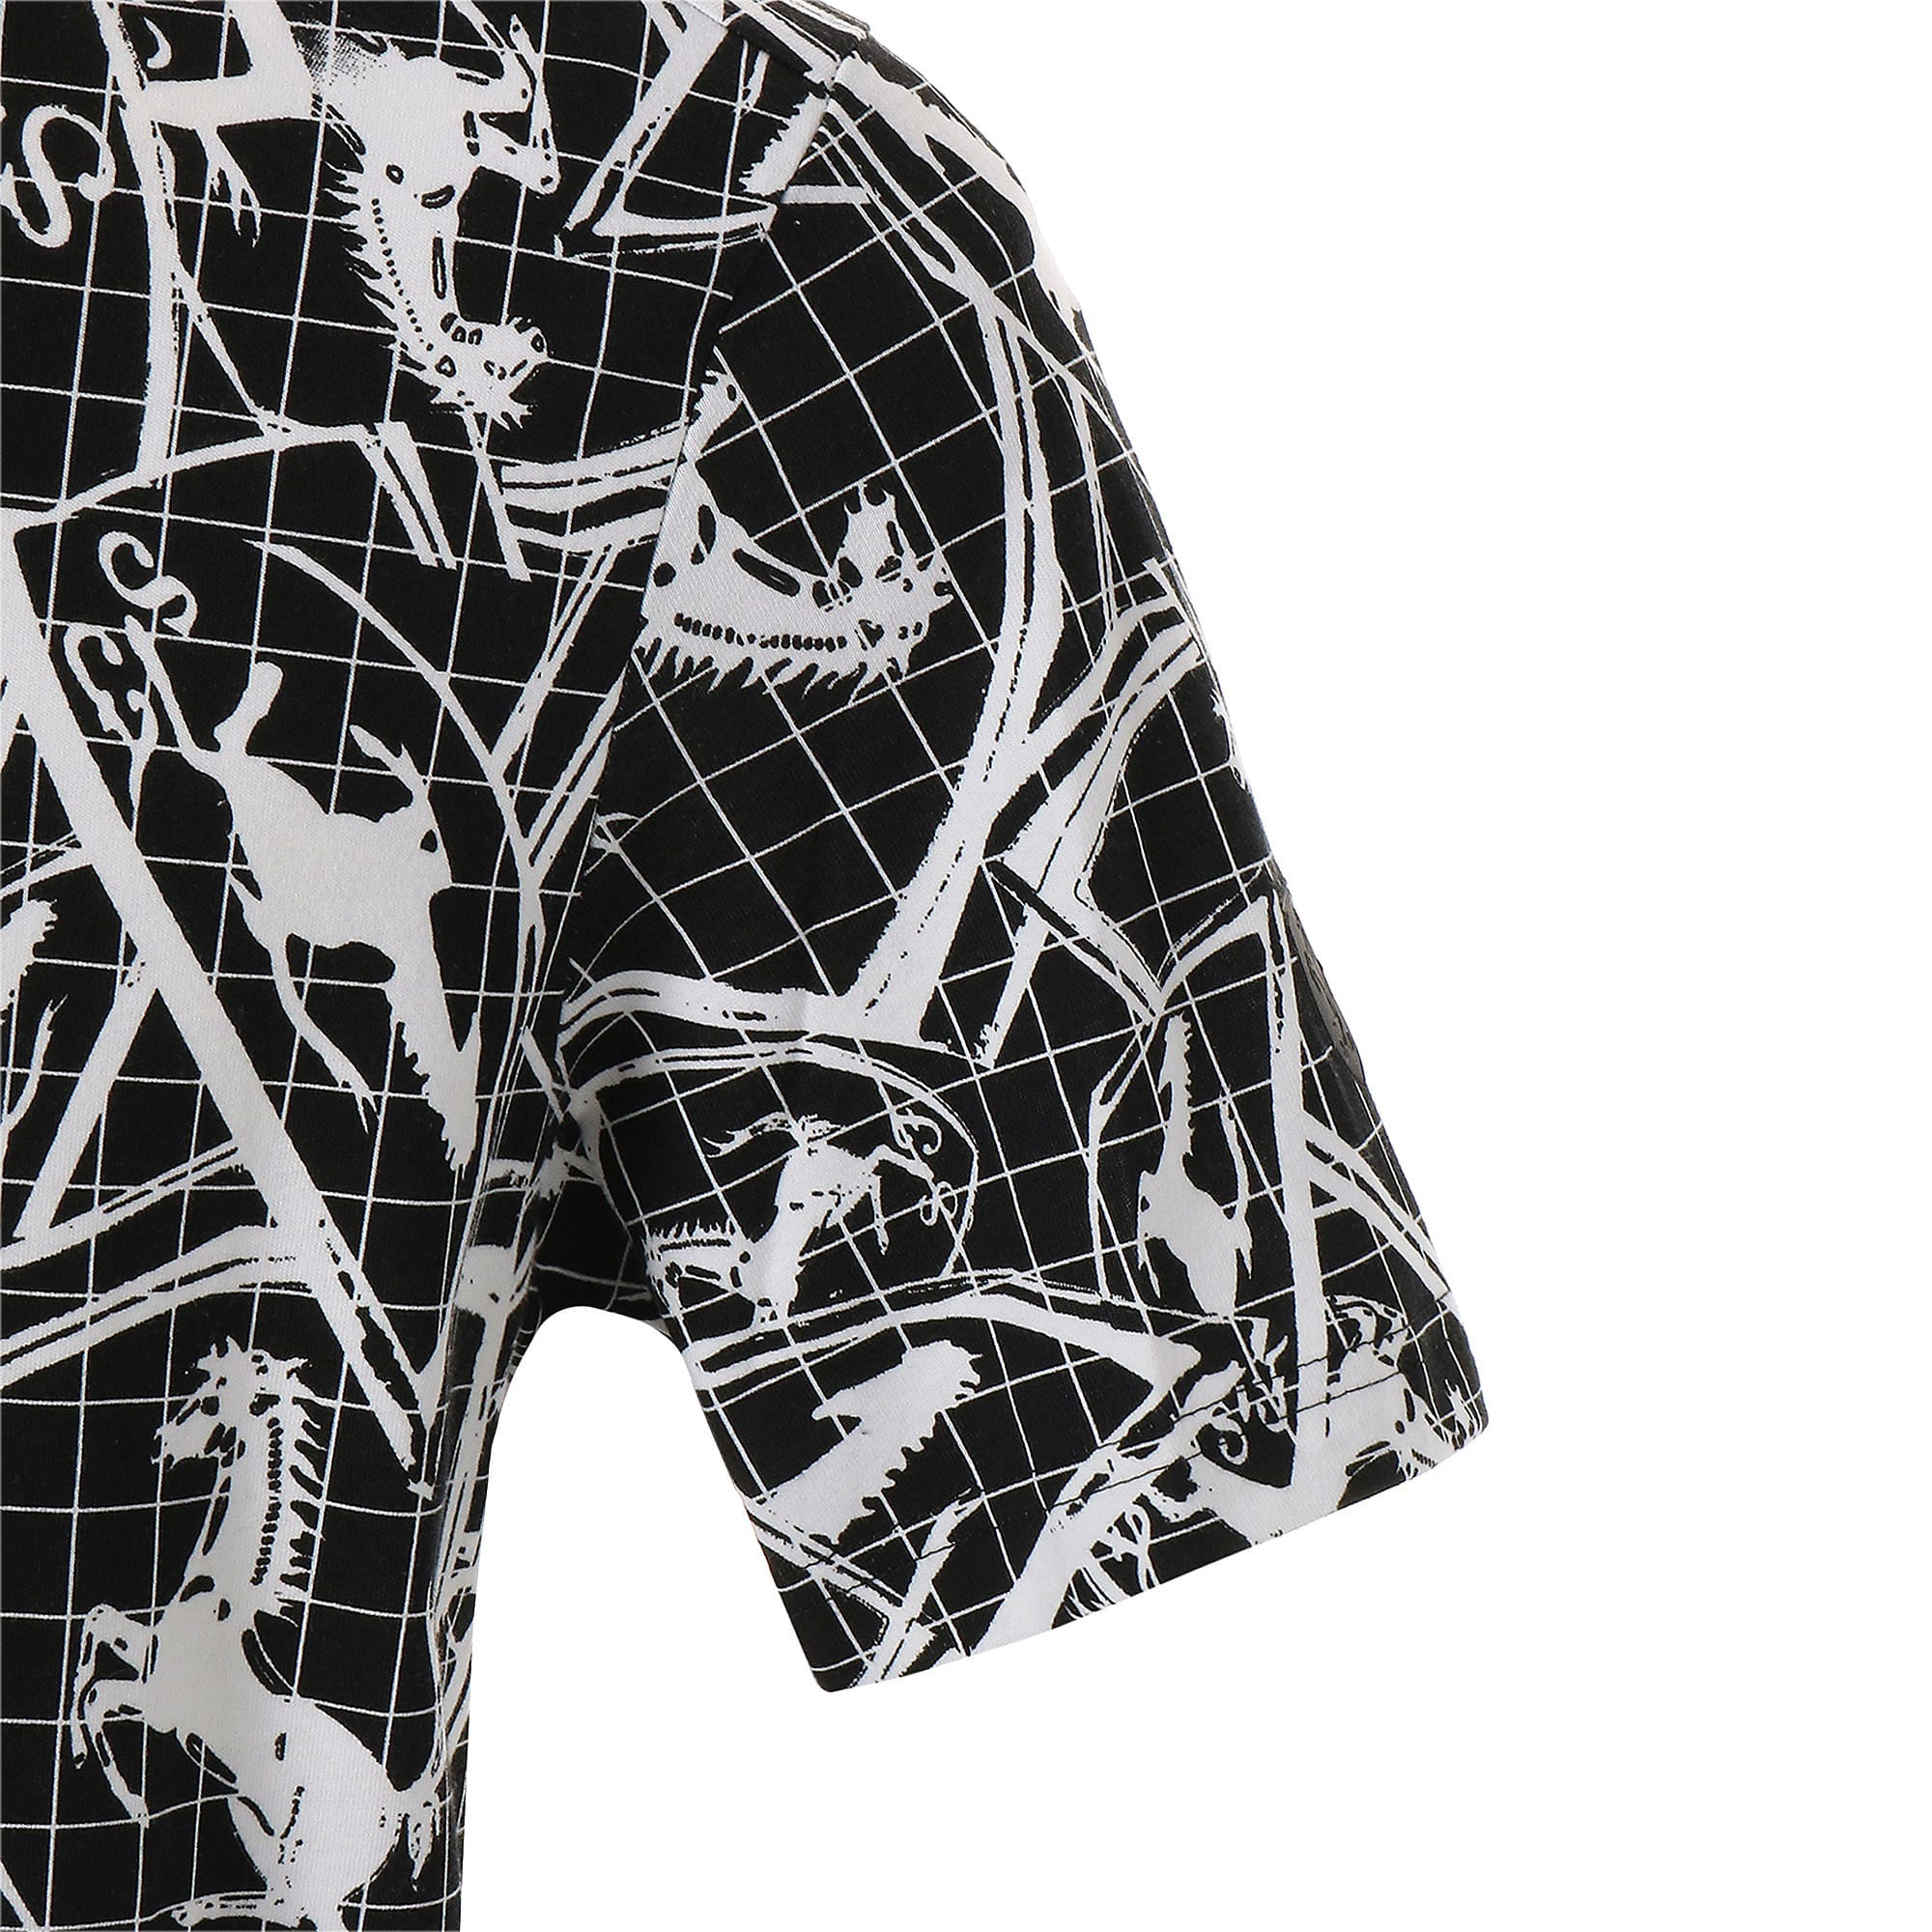 Thumbnail 5 of フェラーリ AOP Tシャツ 半袖, Puma Black, medium-JPN